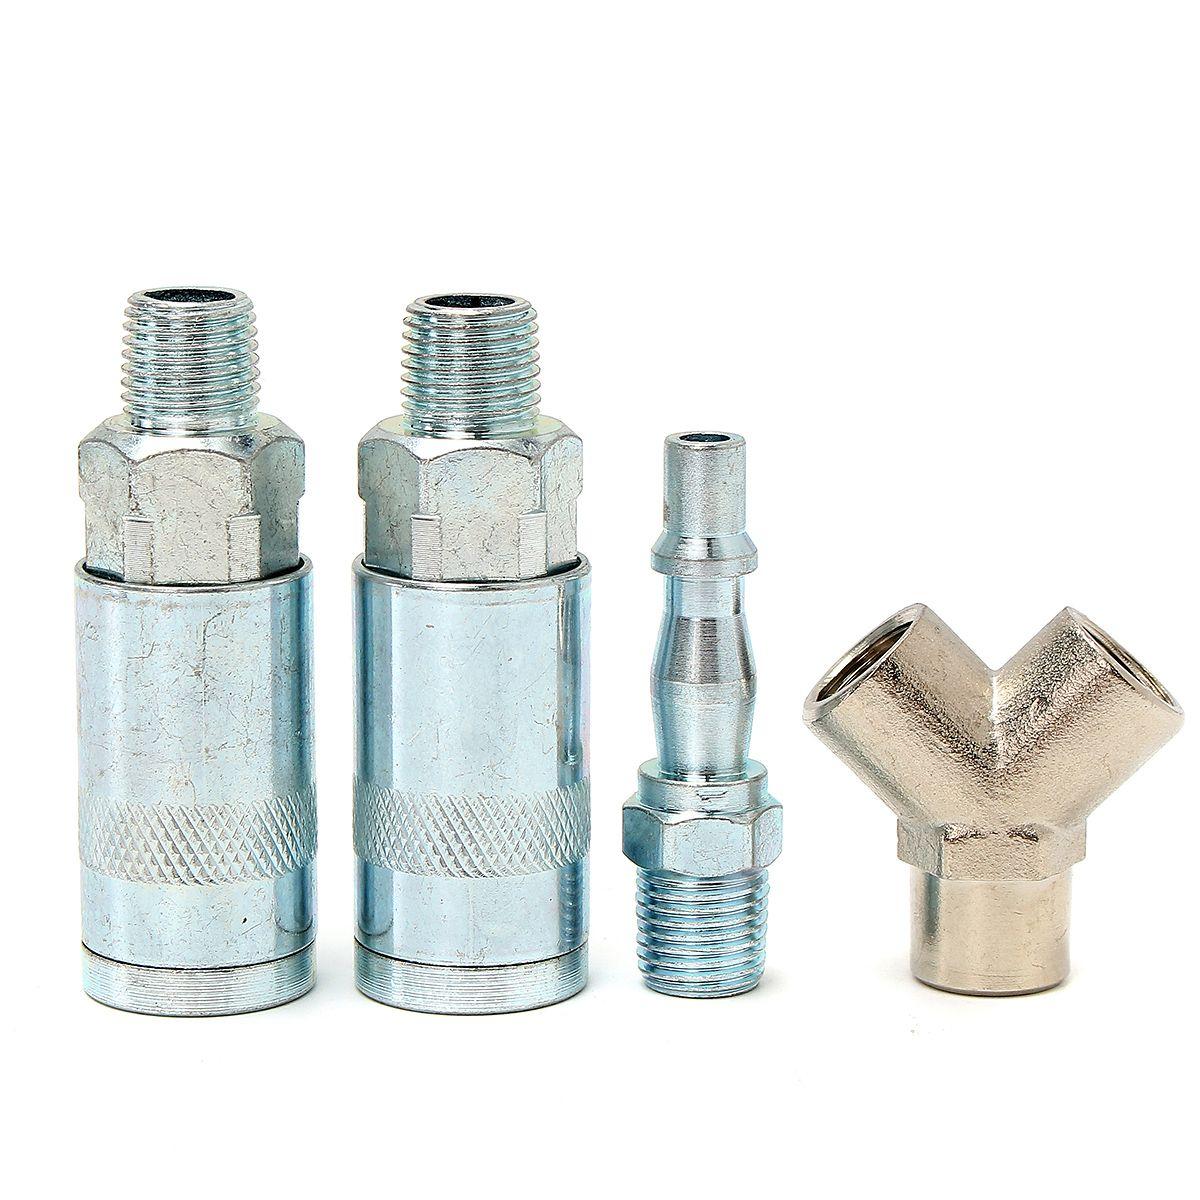 3 vías de liberación rápida adaptador 1/4 Inch BSP línea